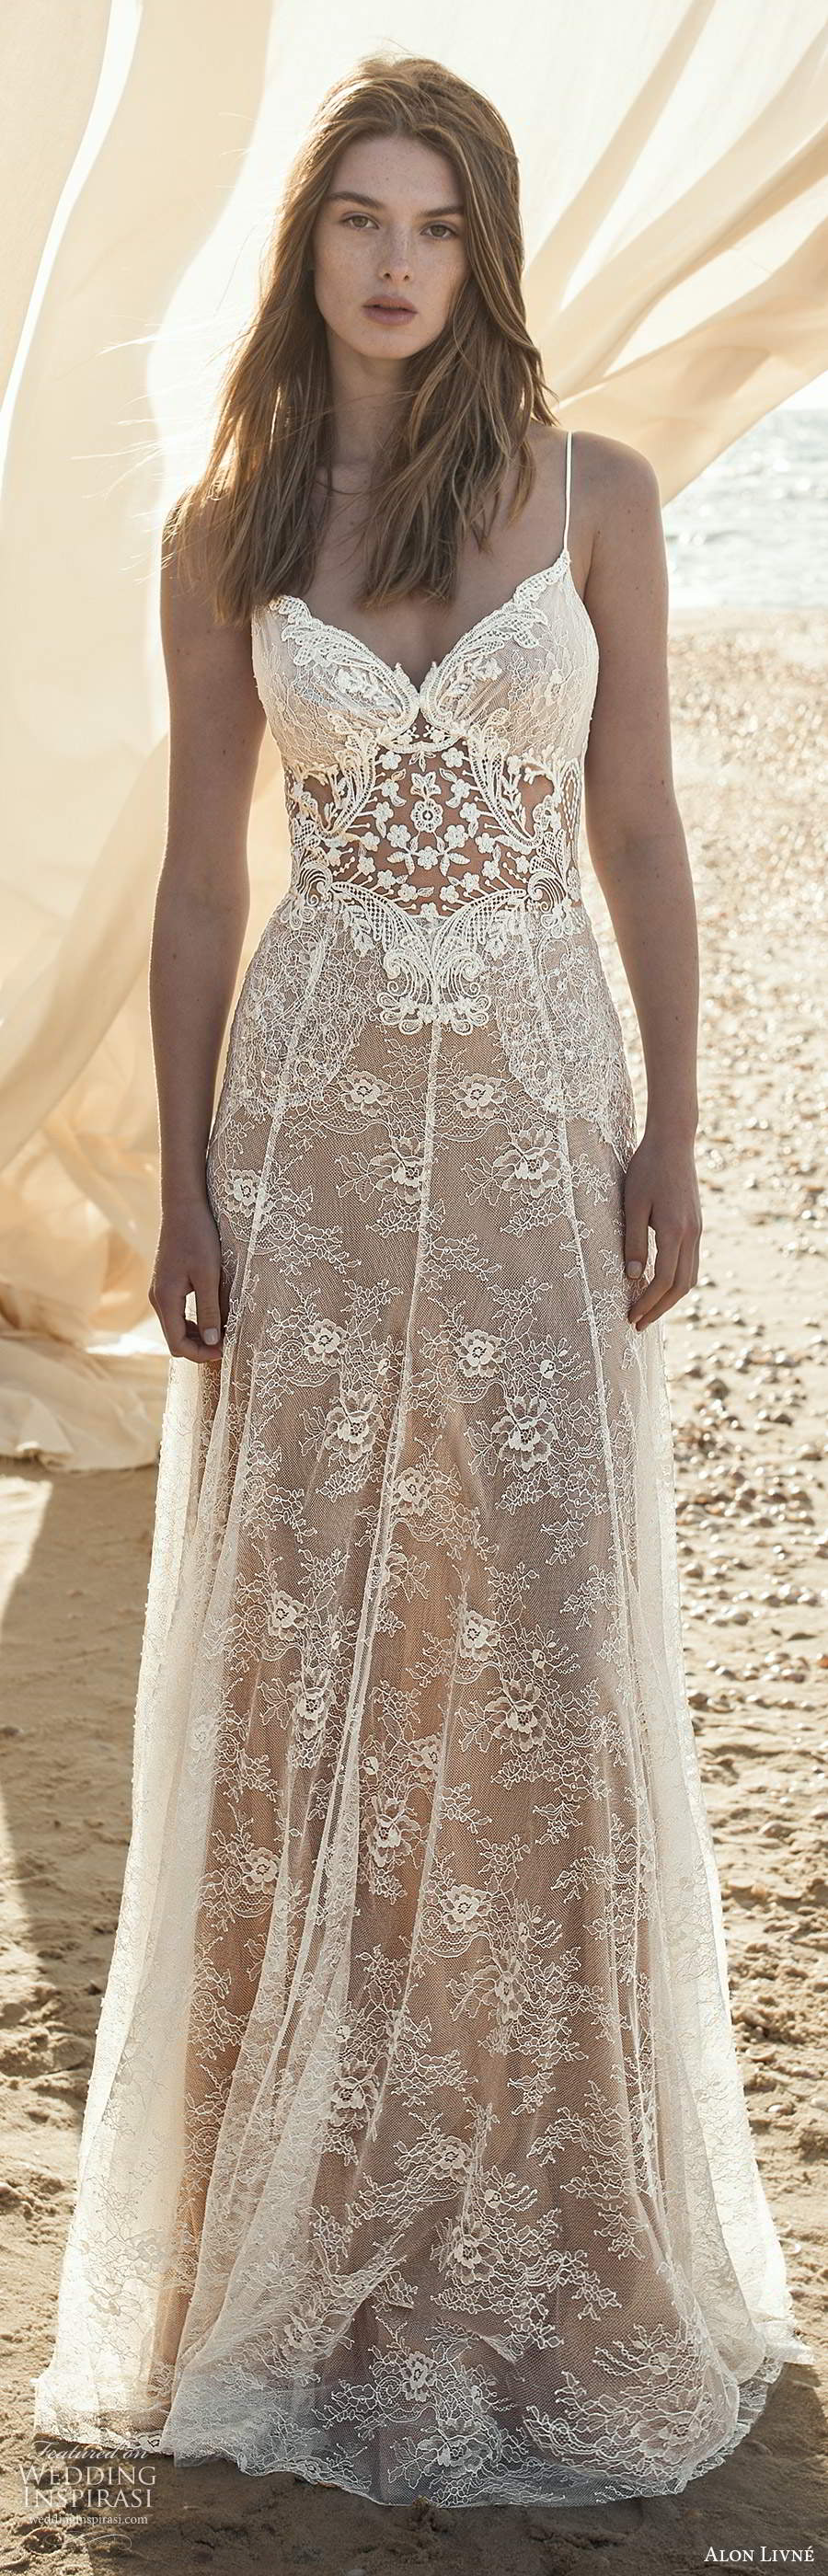 alon livne fall 2020 bridal sleeveless thin straps sweetheart neckline sheer bodice embellished lace a line wedding dress (5) lv